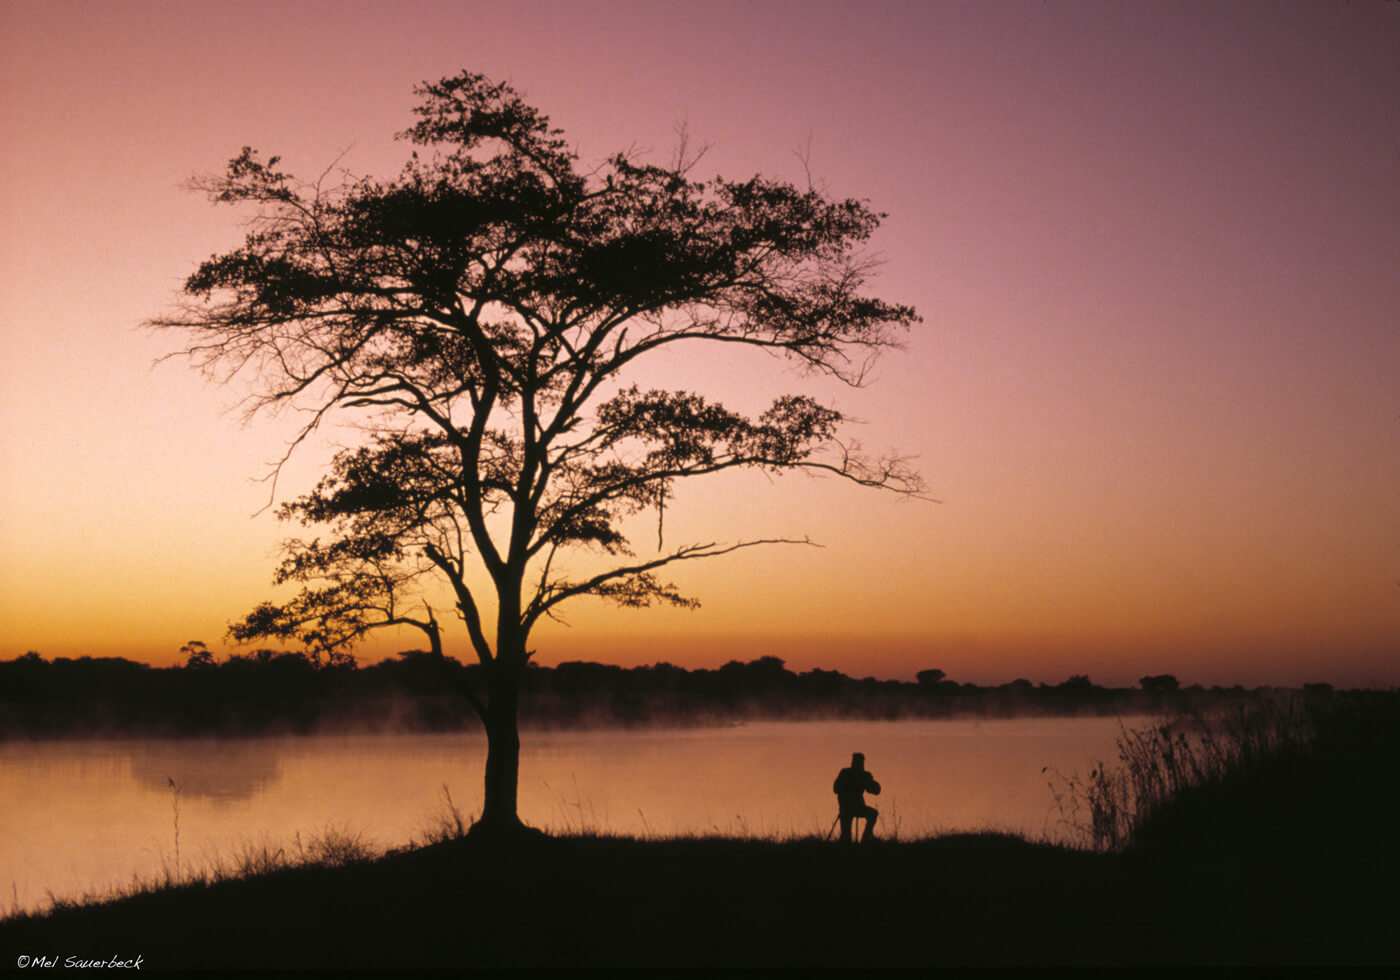 Sunrise Okavango River, Africa